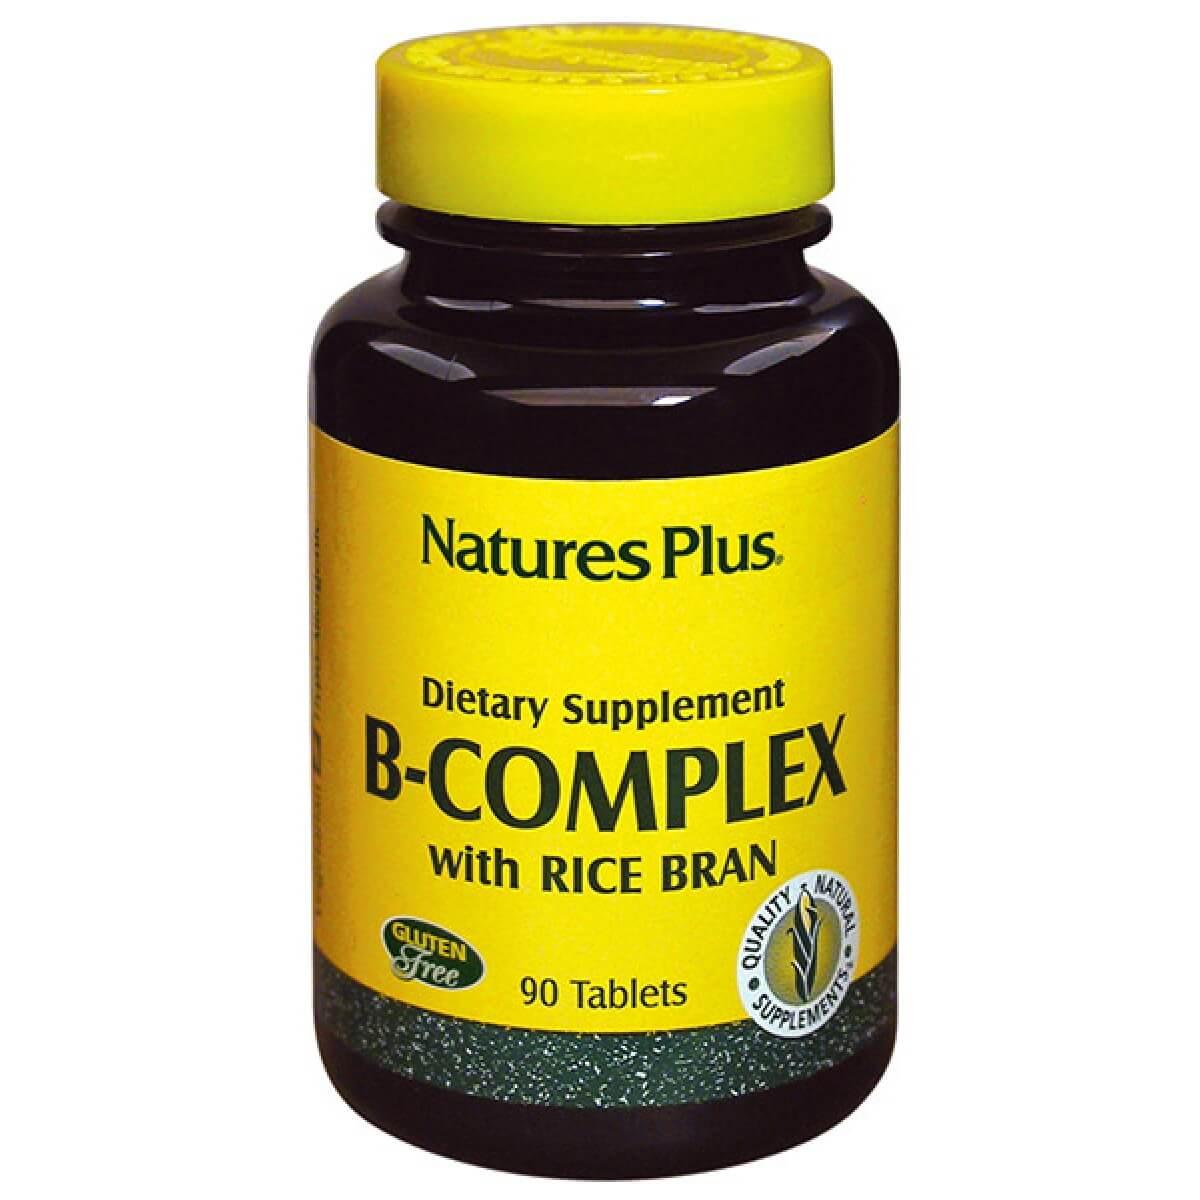 Nature's Plus Vitamin B-Complex with Rice Bran Ανακουφίζει Από το Αίσθημα Κόπωσης 90tabs